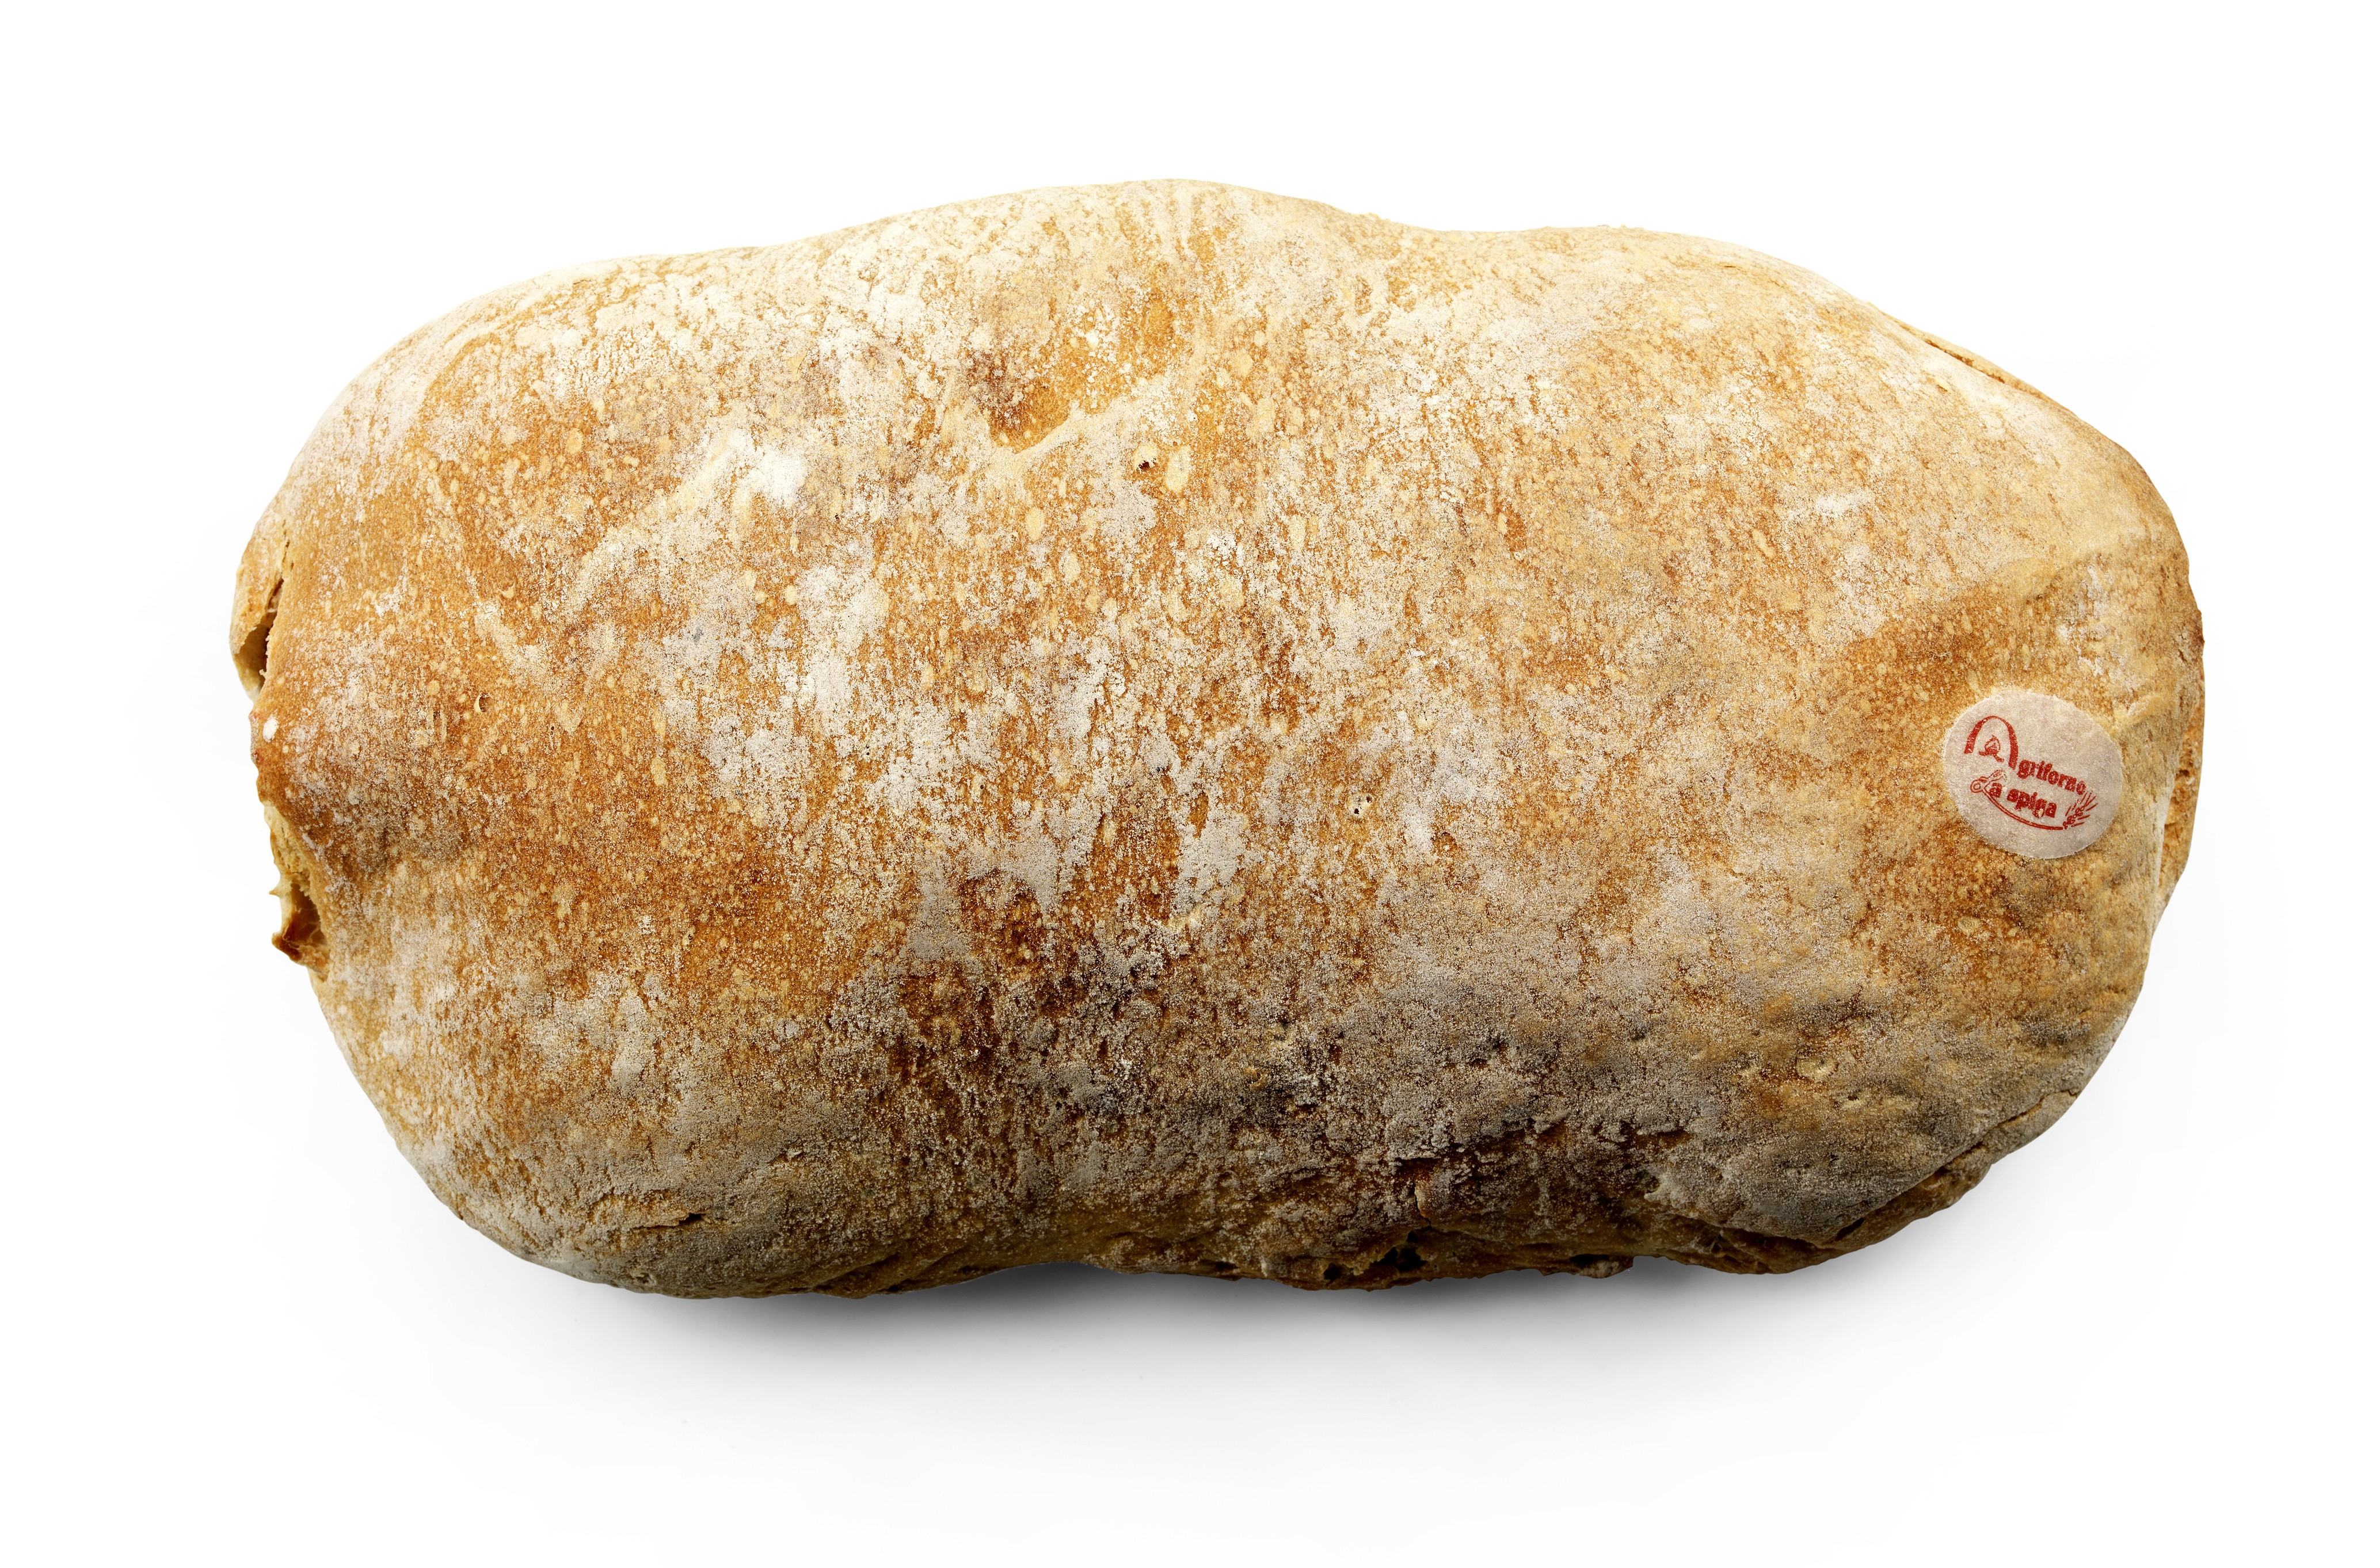 Pane cuscinetto bianco